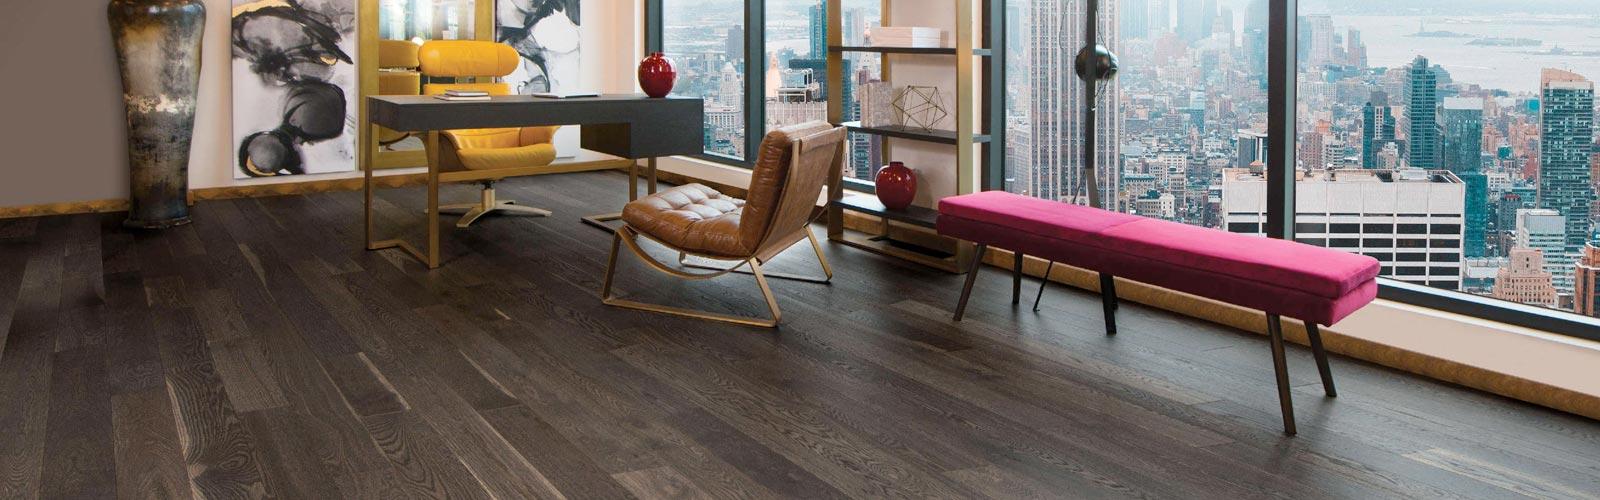 Custom Wood Floors - New York and New Jersey Flooring Store ...